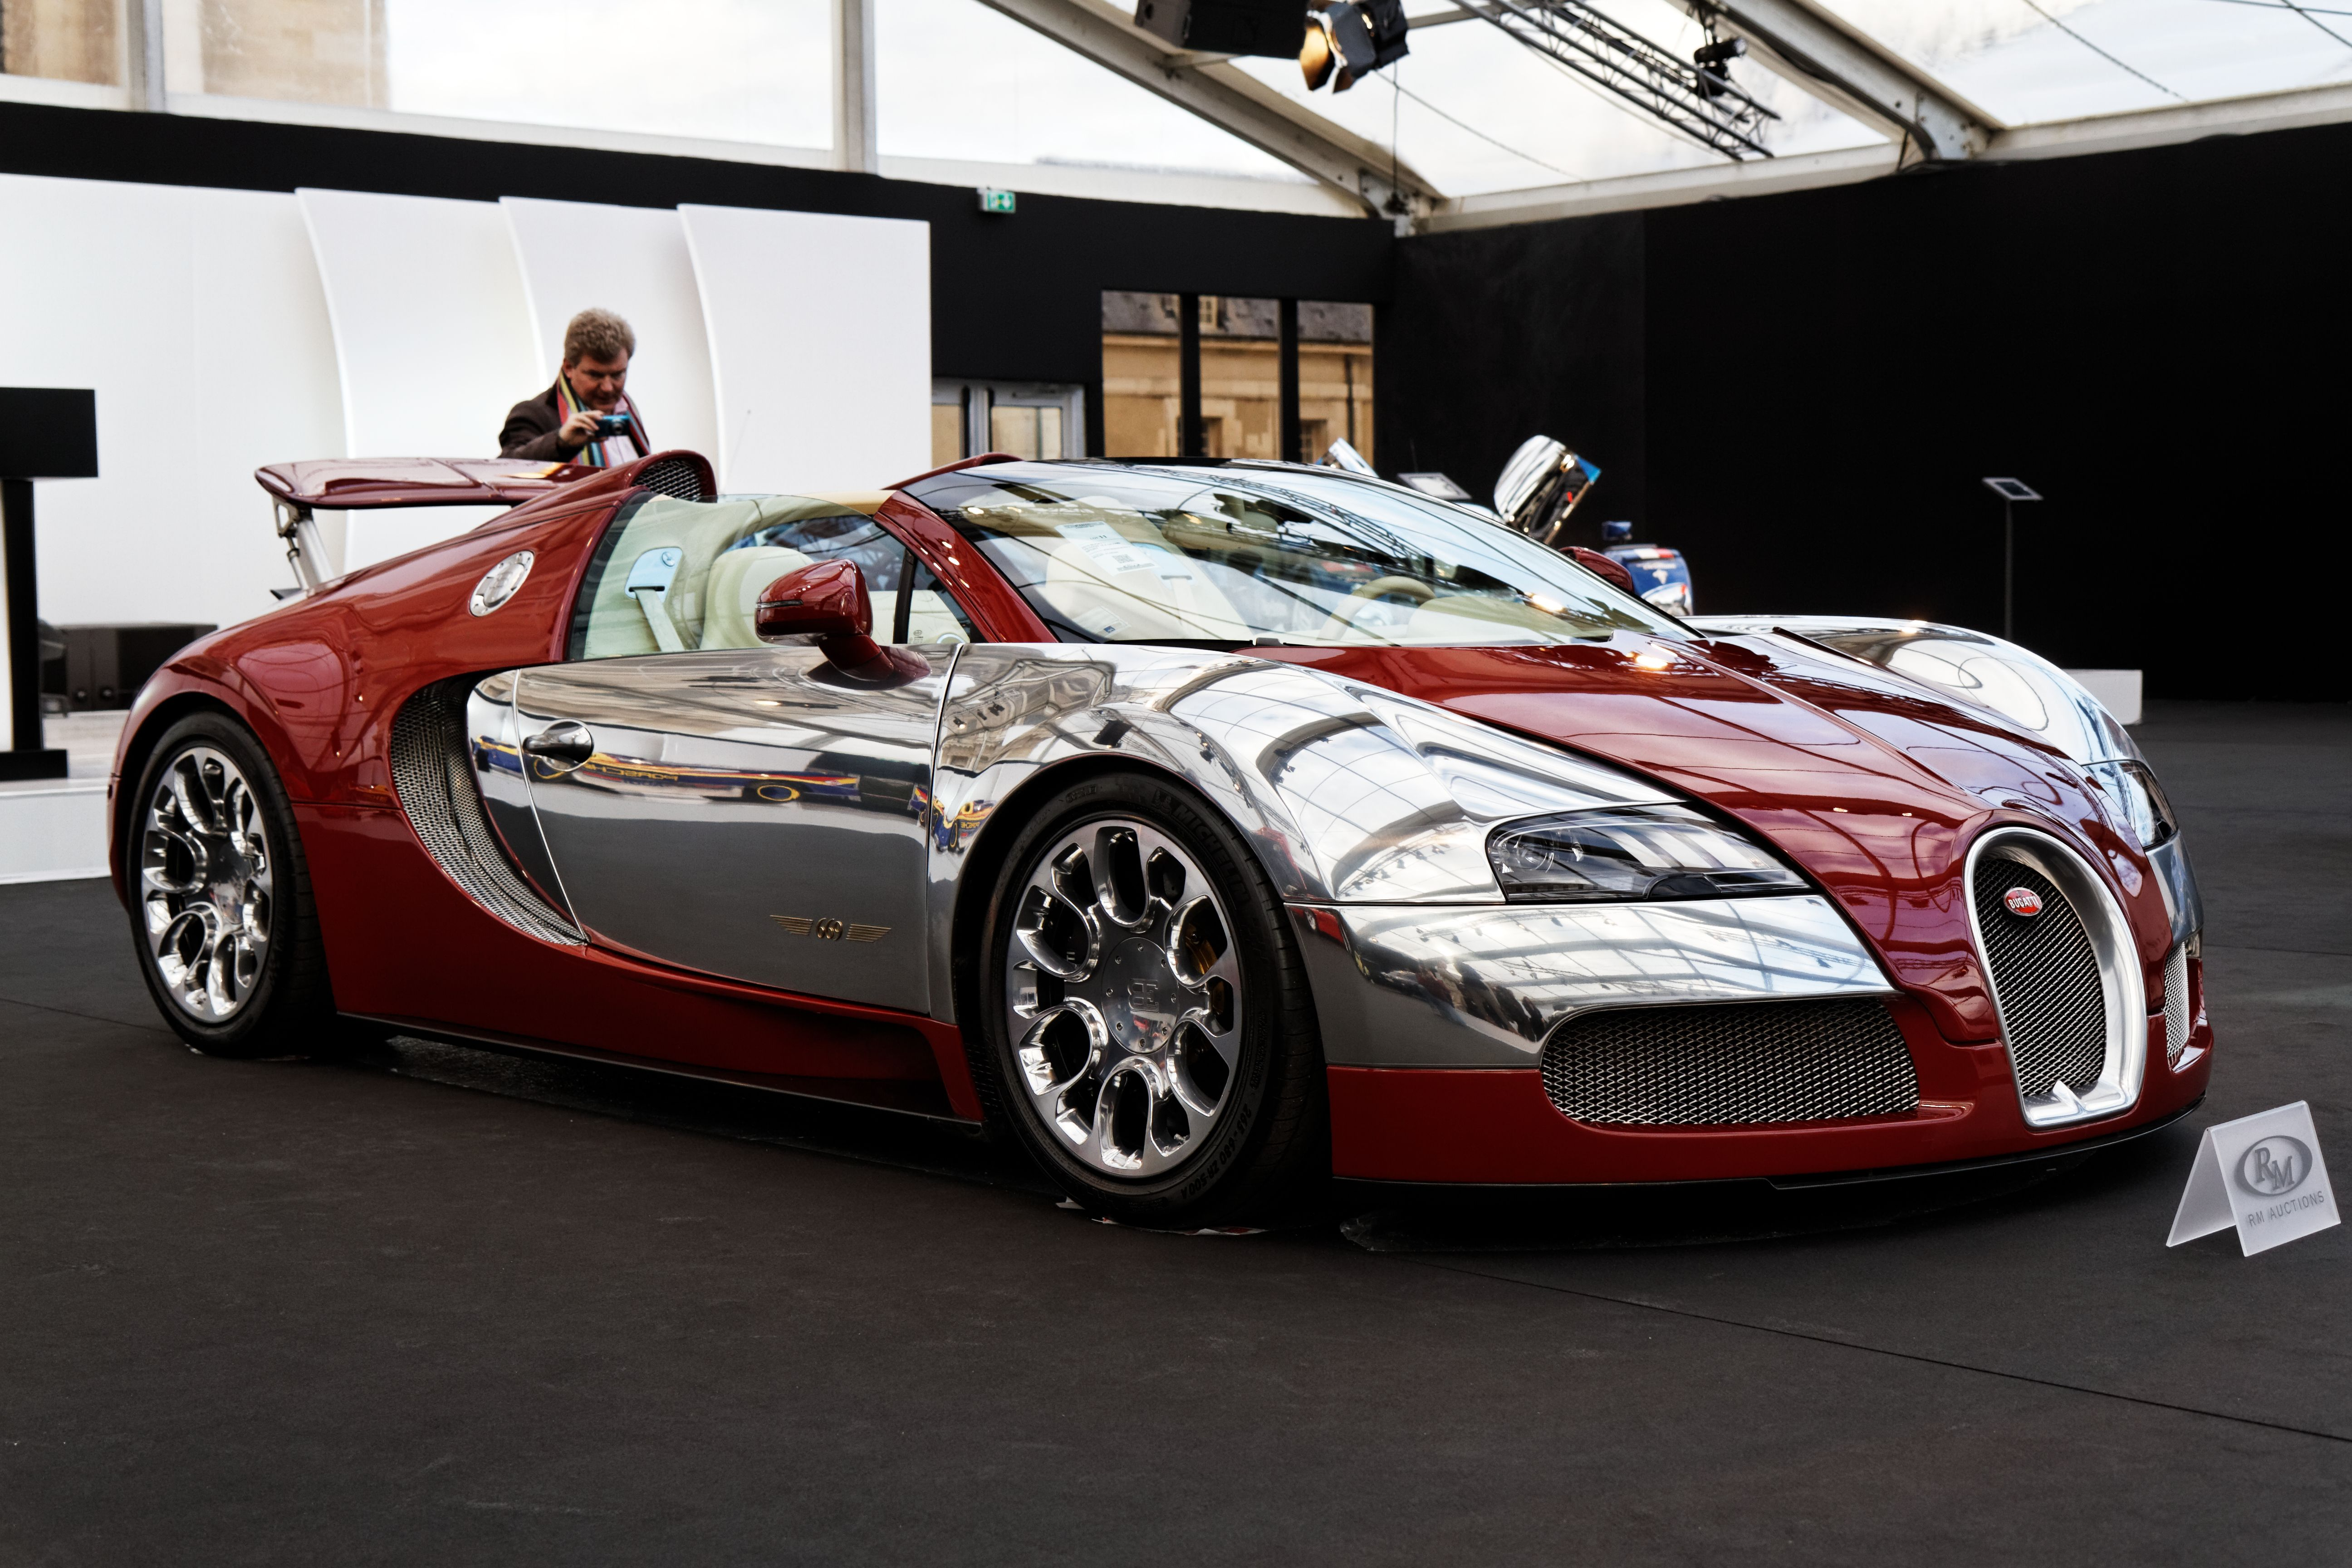 71f06cf500f38ca45ad50982e87b5fb7 Surprising Bugatti Veyron 16.4 Grand Sport Vitesse Acceleration Cars Trend